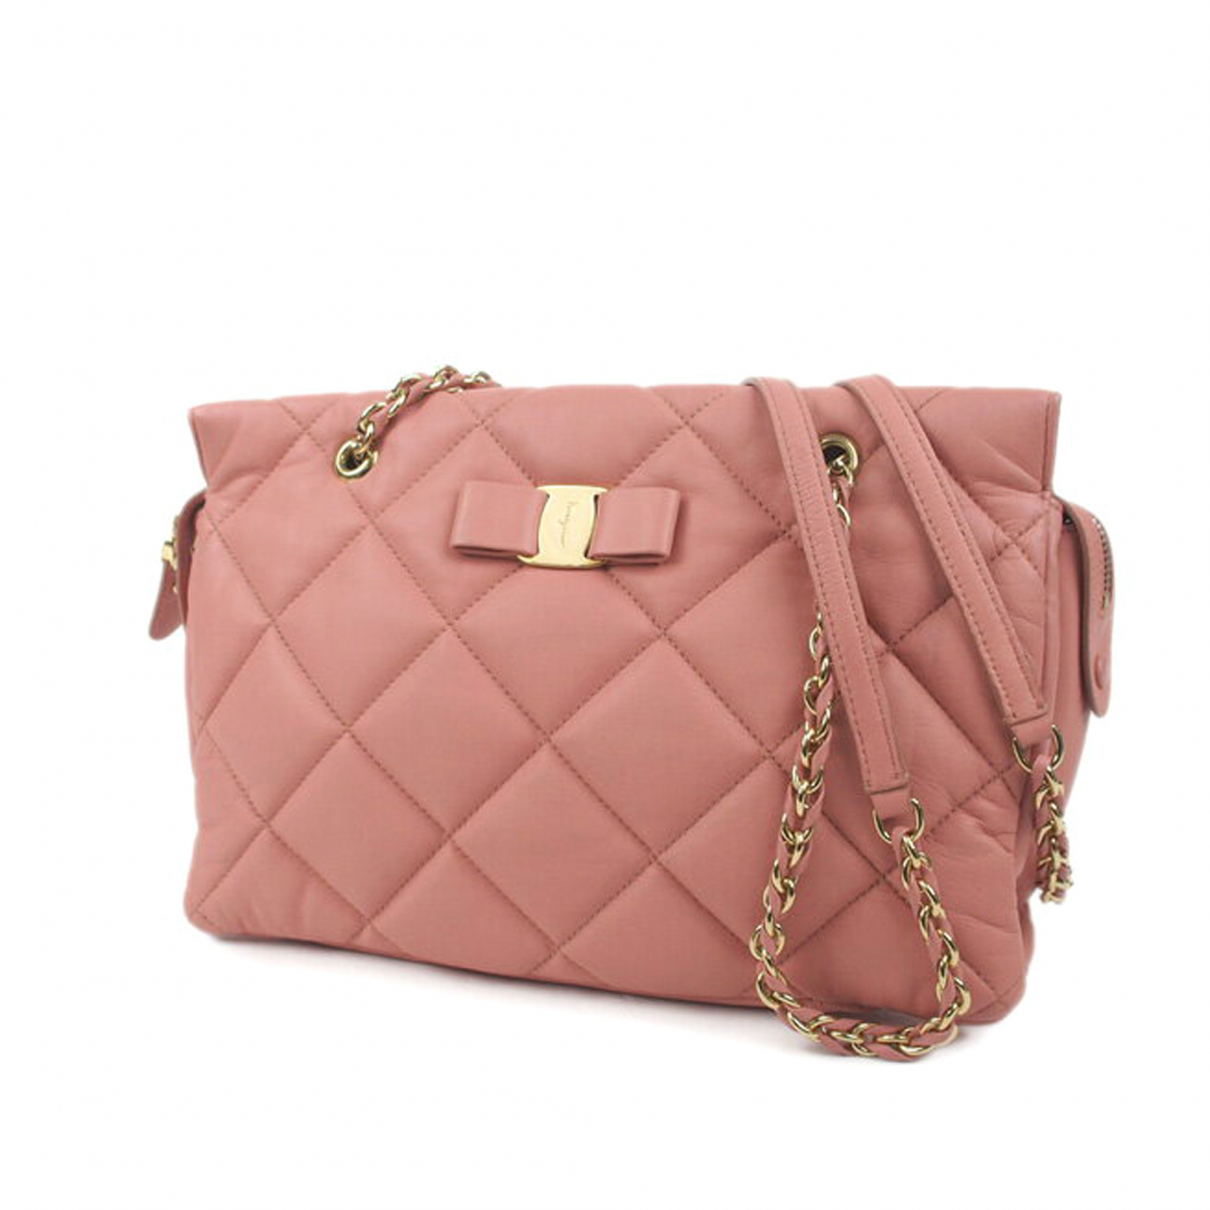 Salvatore Ferragamo N Pink Leather handbag for Women N